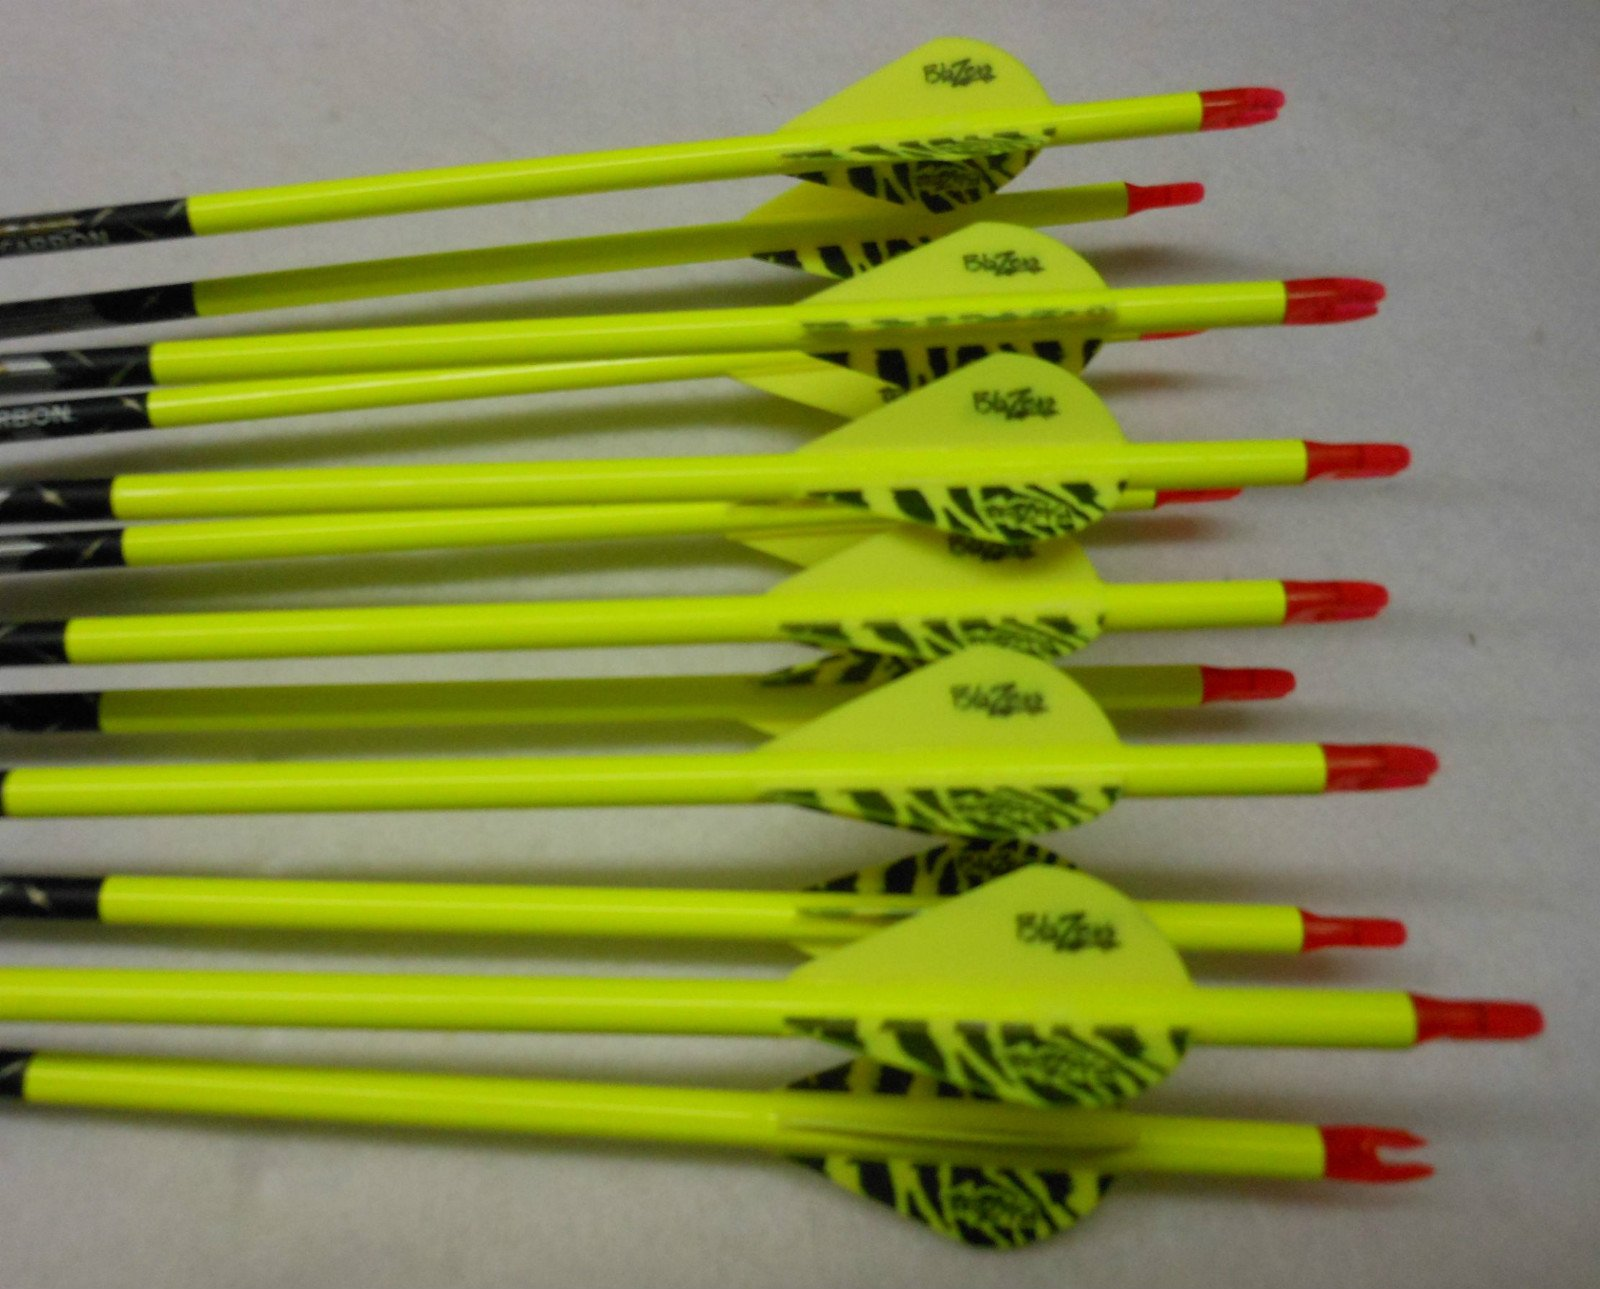 Easton ST Axis Full Metal Jacket 330 Deep Six N Fused Arrows w/Blazer Vanes Wraps 1 Dz.